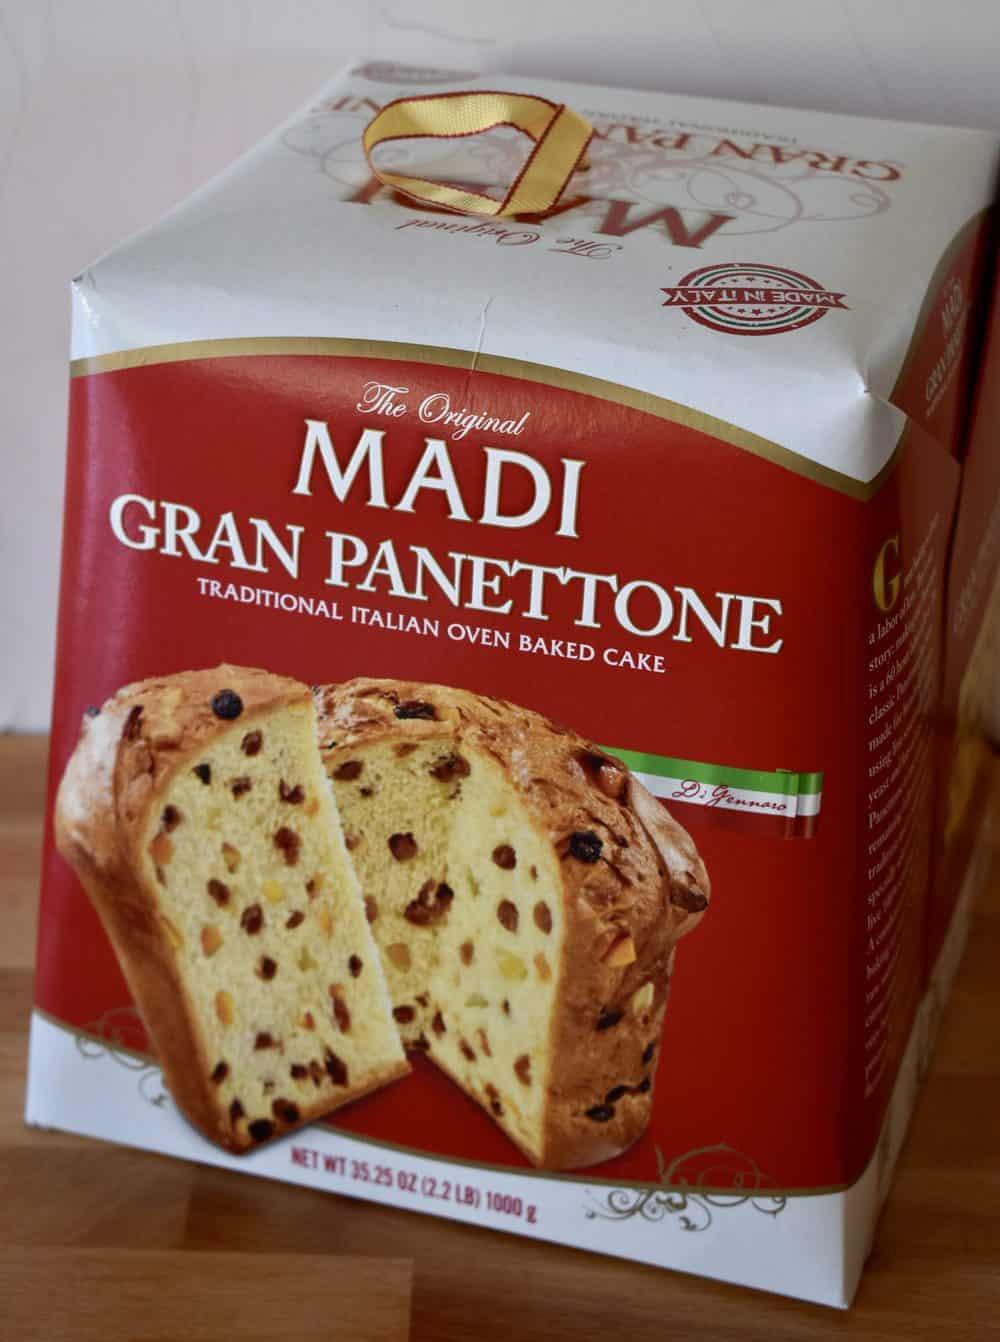 Box of Madi Gran Panettone.